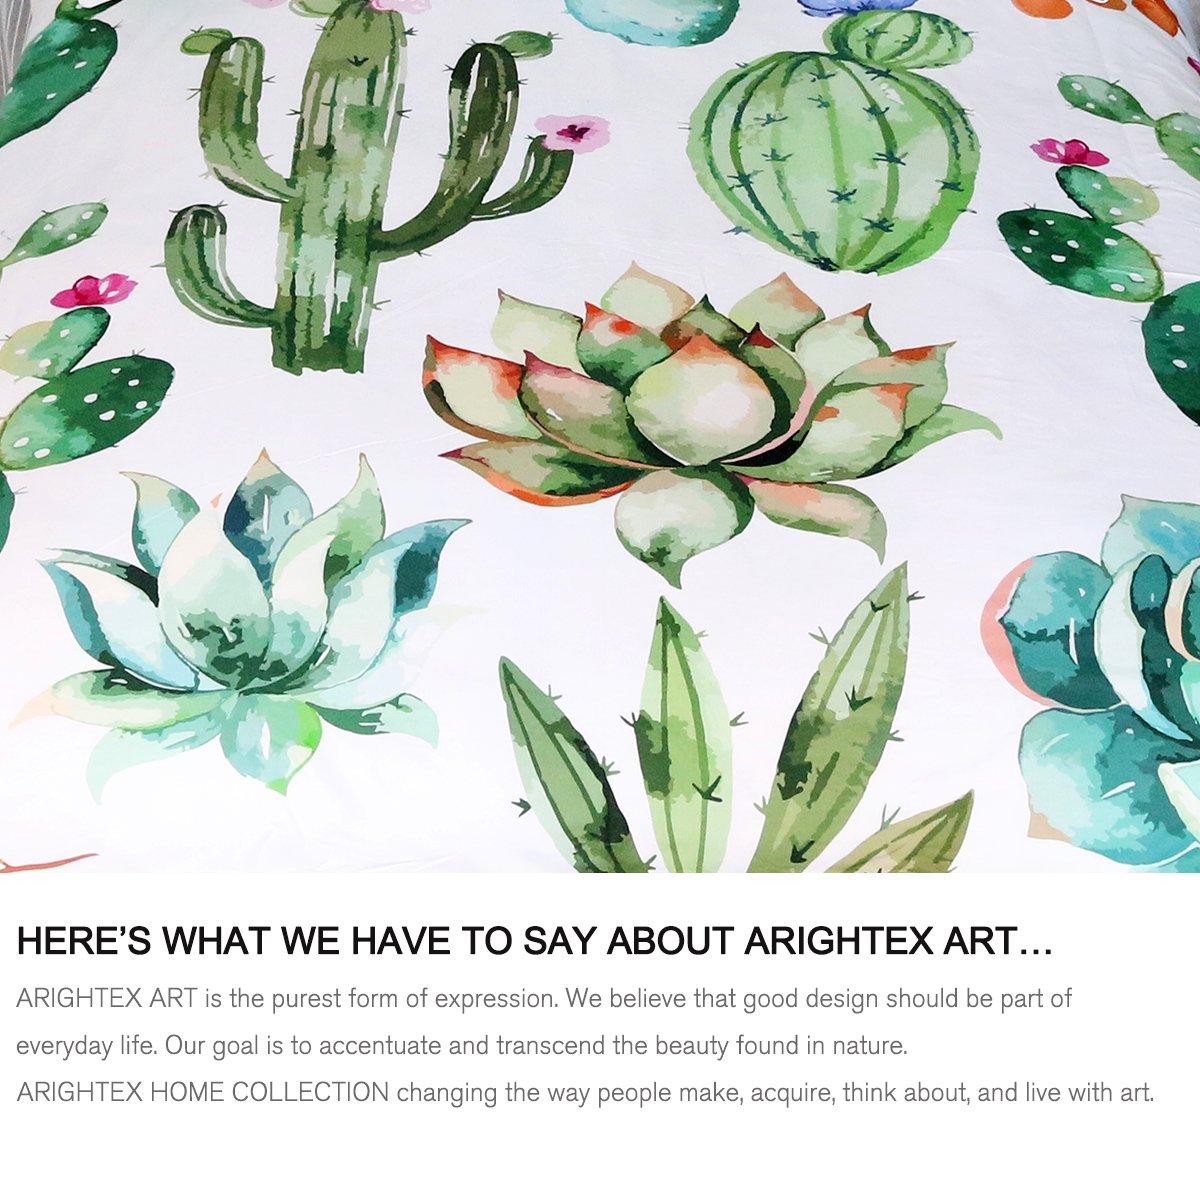 Queen Arightex Cactus Bedding Cactus Duvet Cover Summer Plant Bed Set Nature Duvet Cover Set Bright Dorm Bedding Kingtex